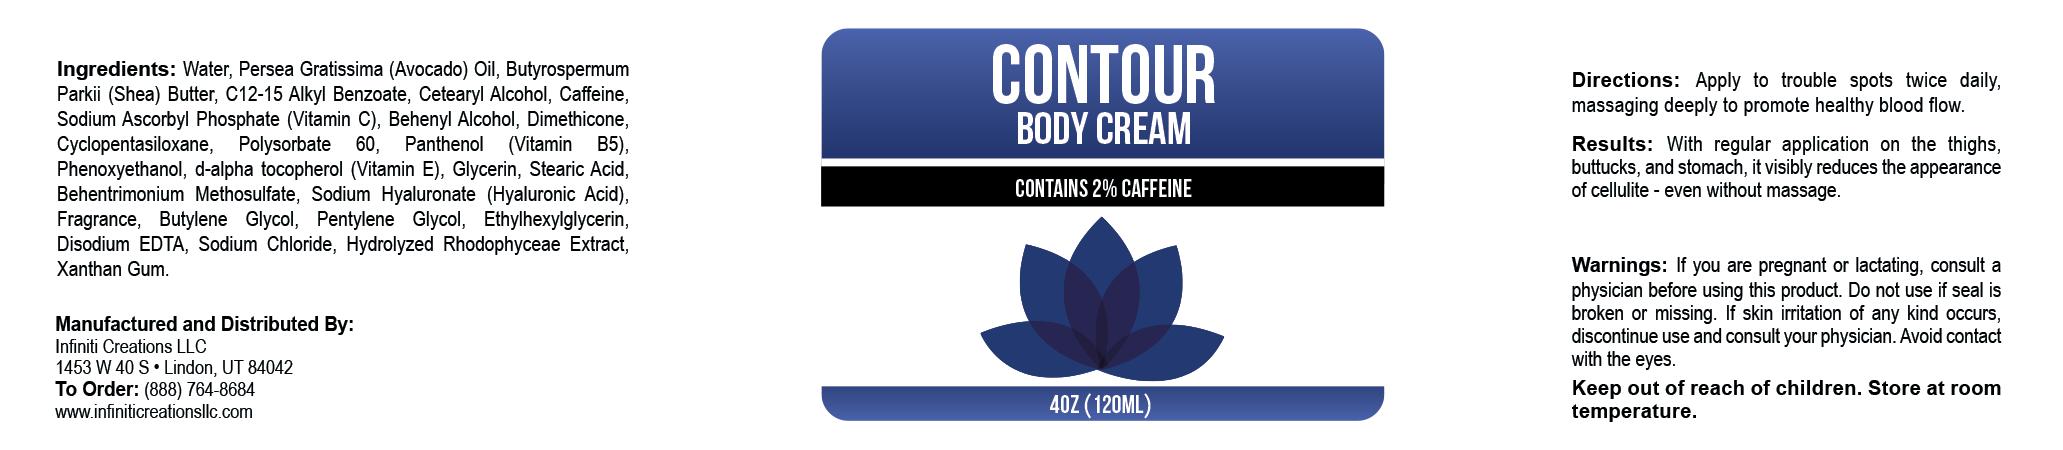 infiniti-creations-contour-body-cream-label.png